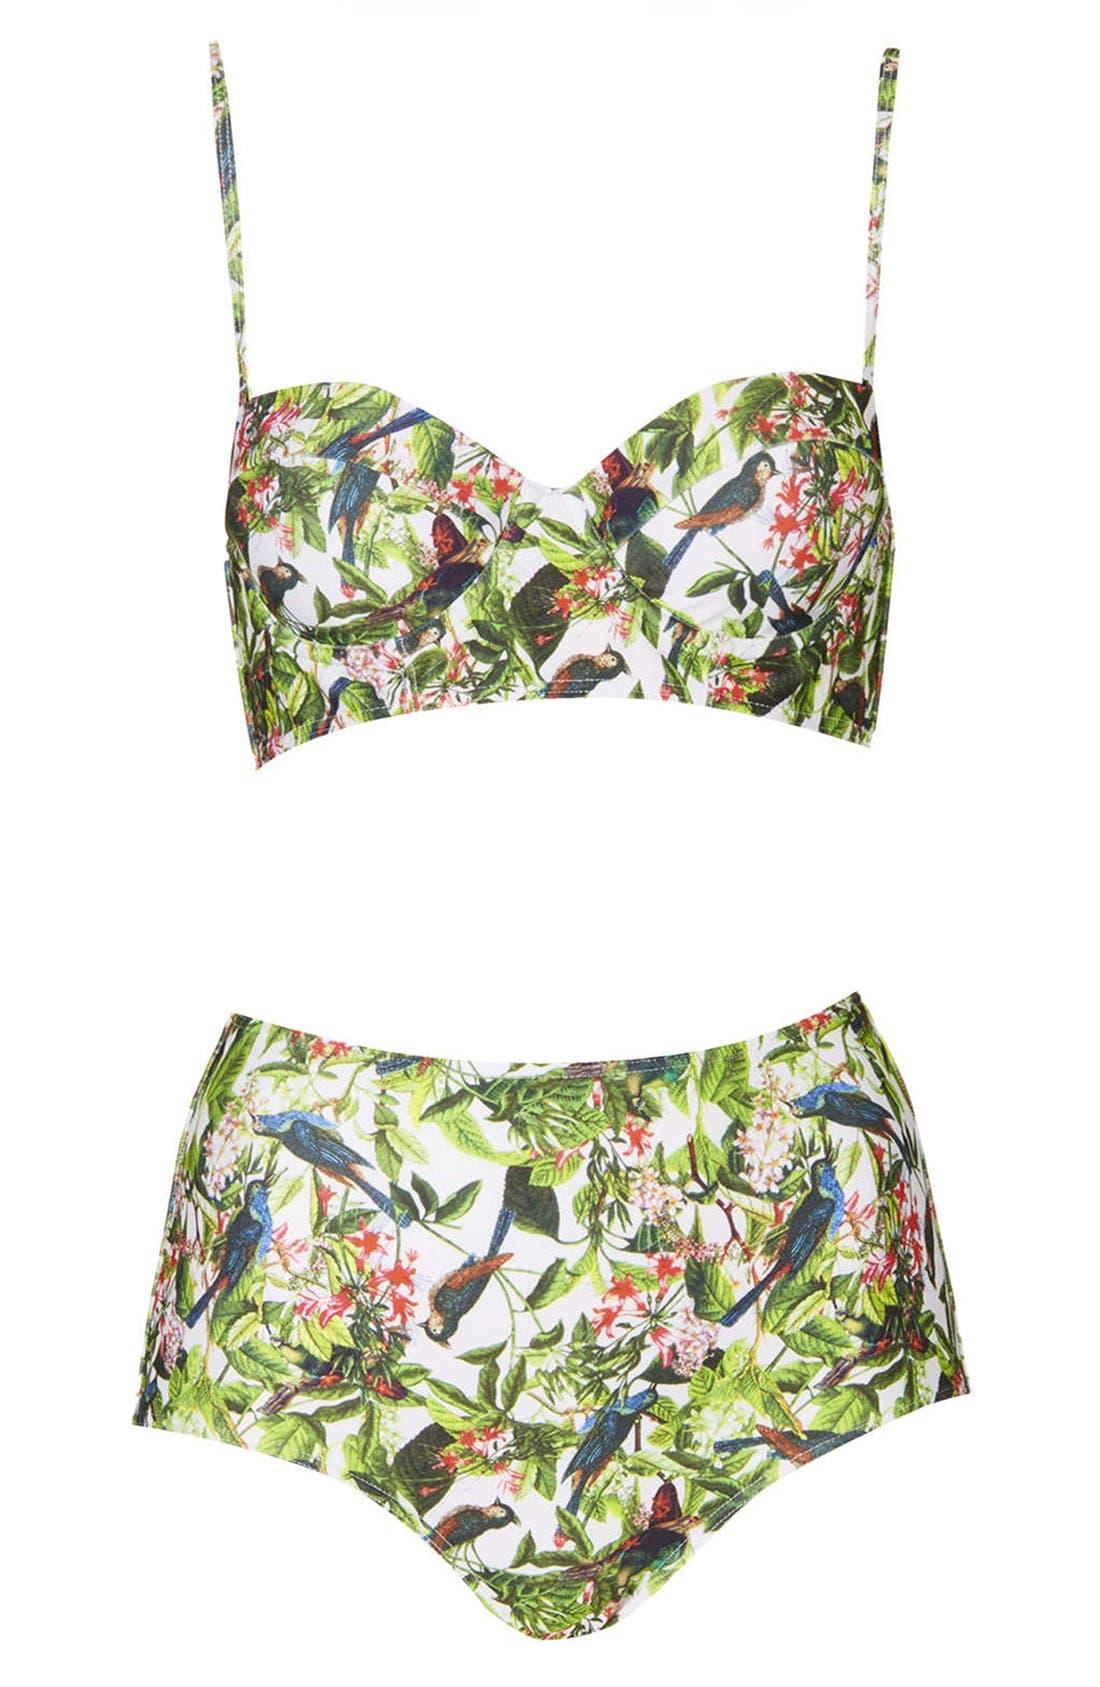 Leaf Print High Rise Bikini,                             Main thumbnail 1, color,                             100